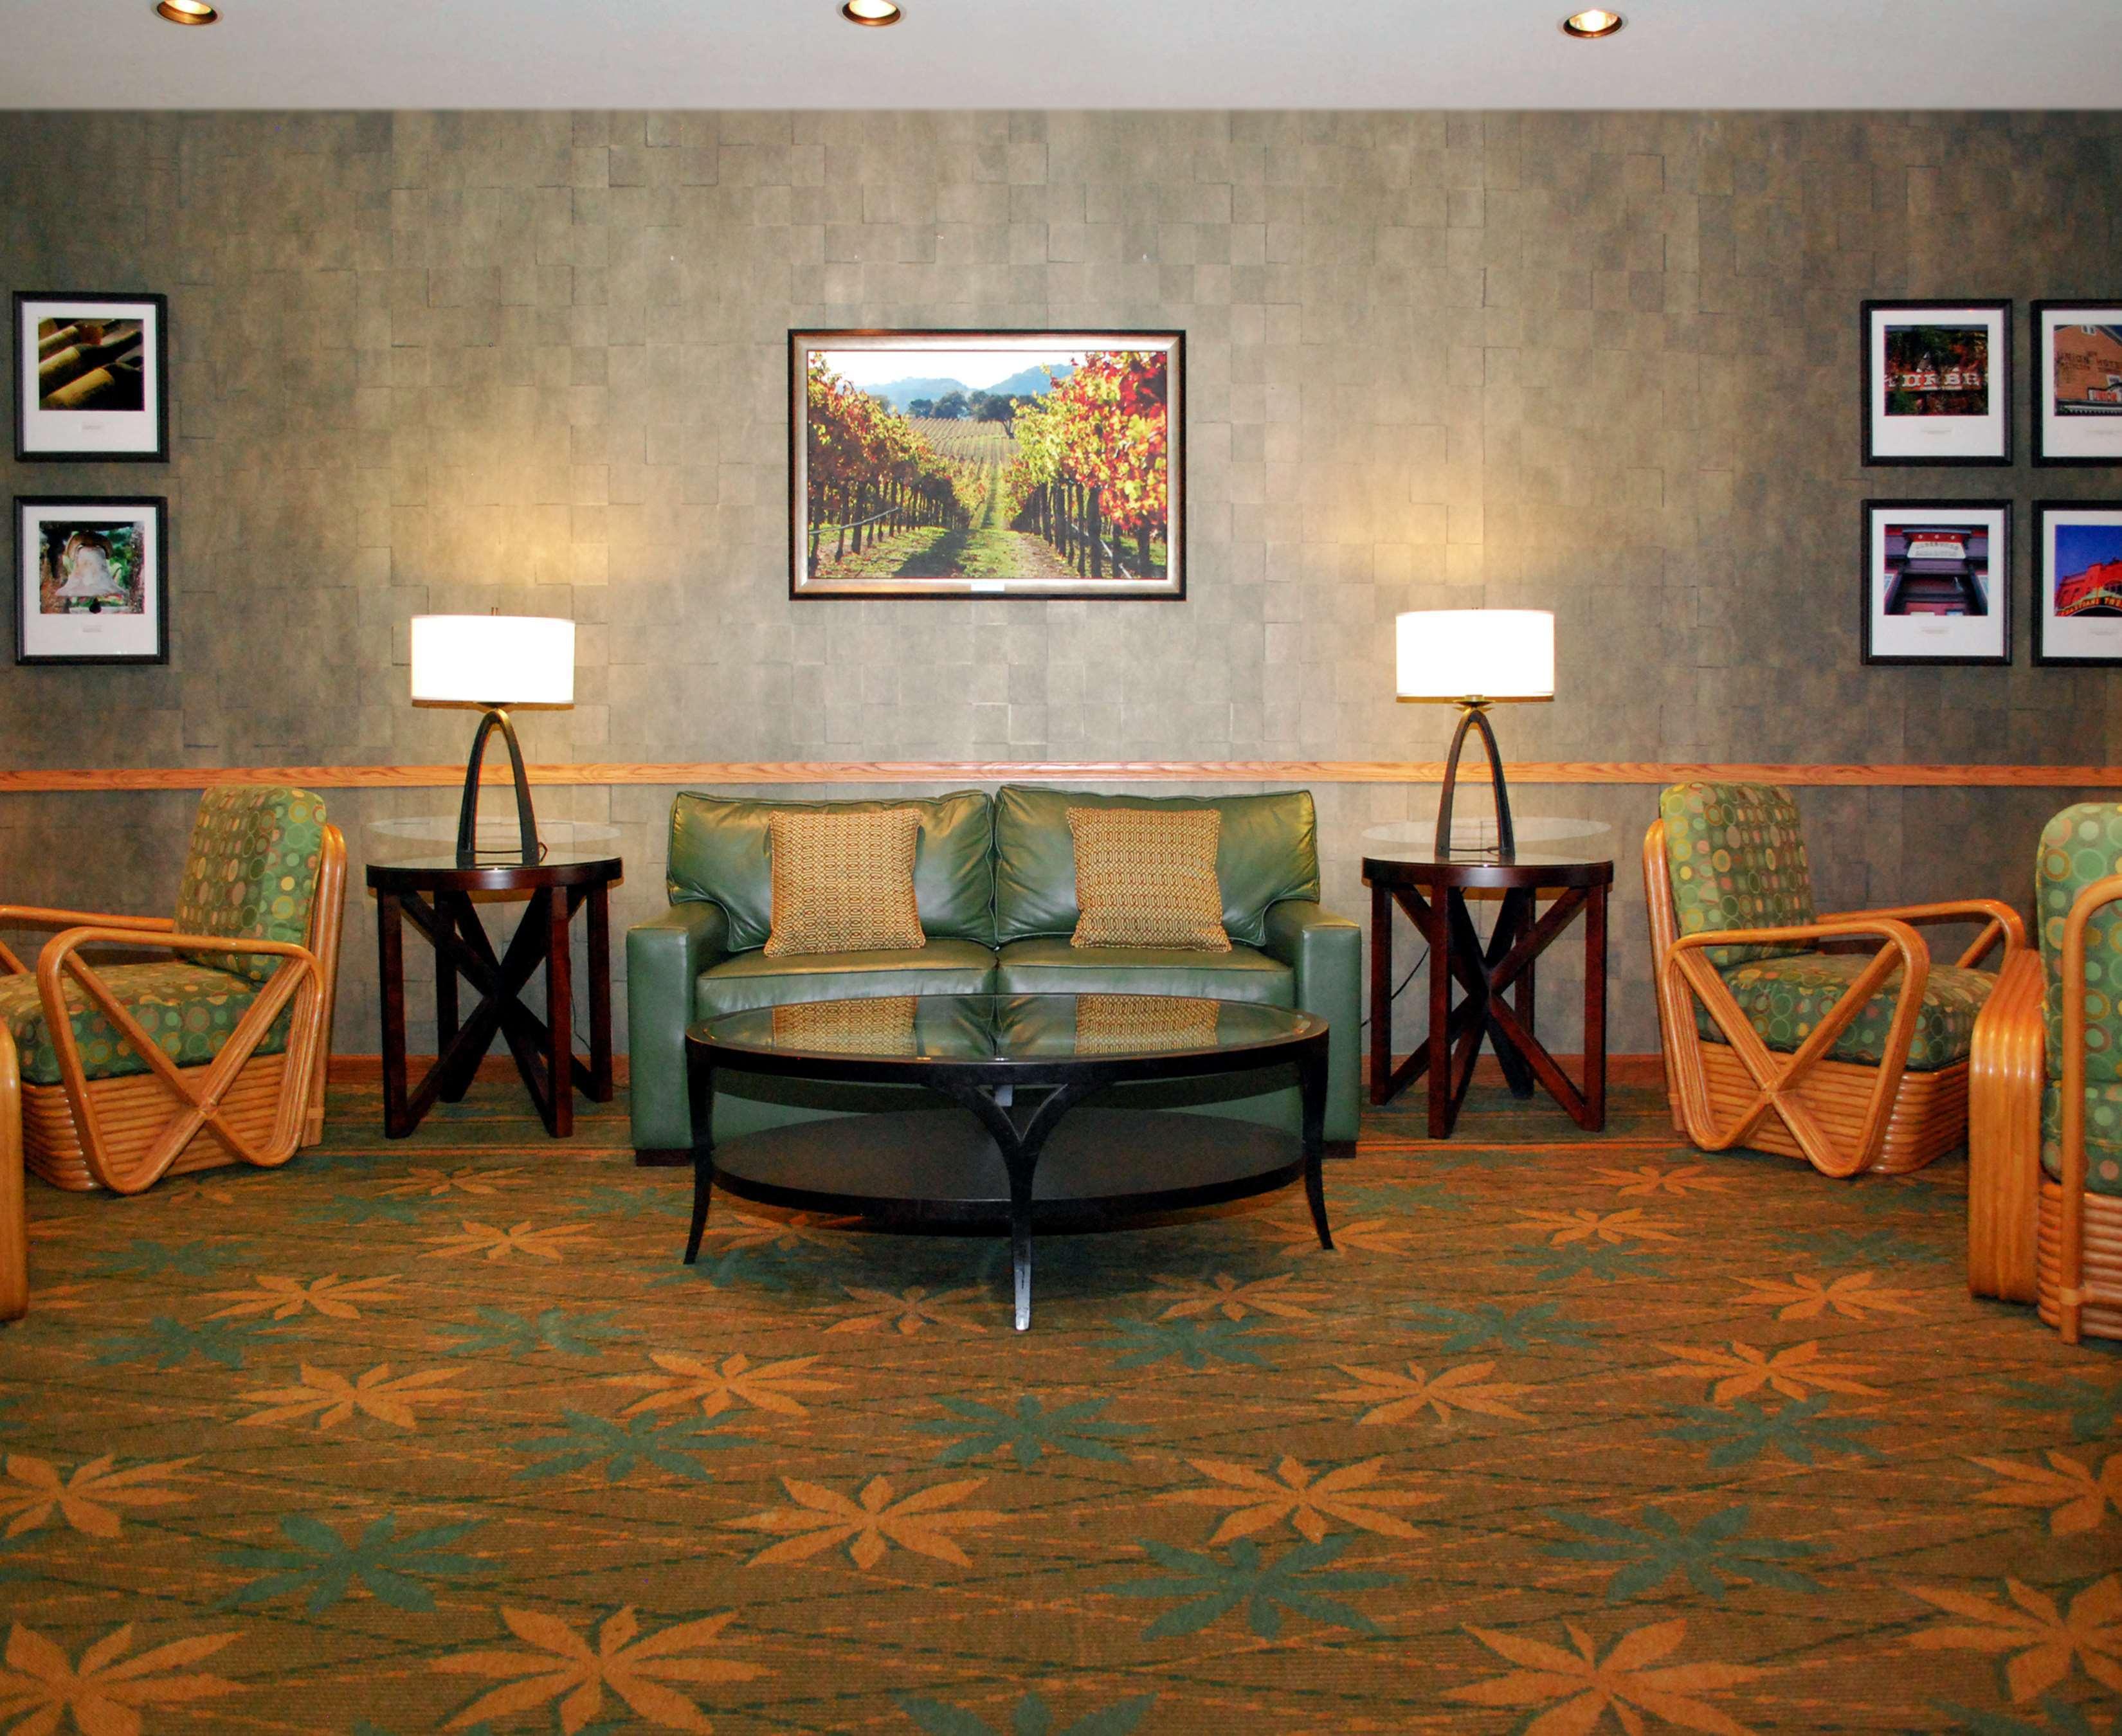 Hilton Sonoma Wine Country image 0